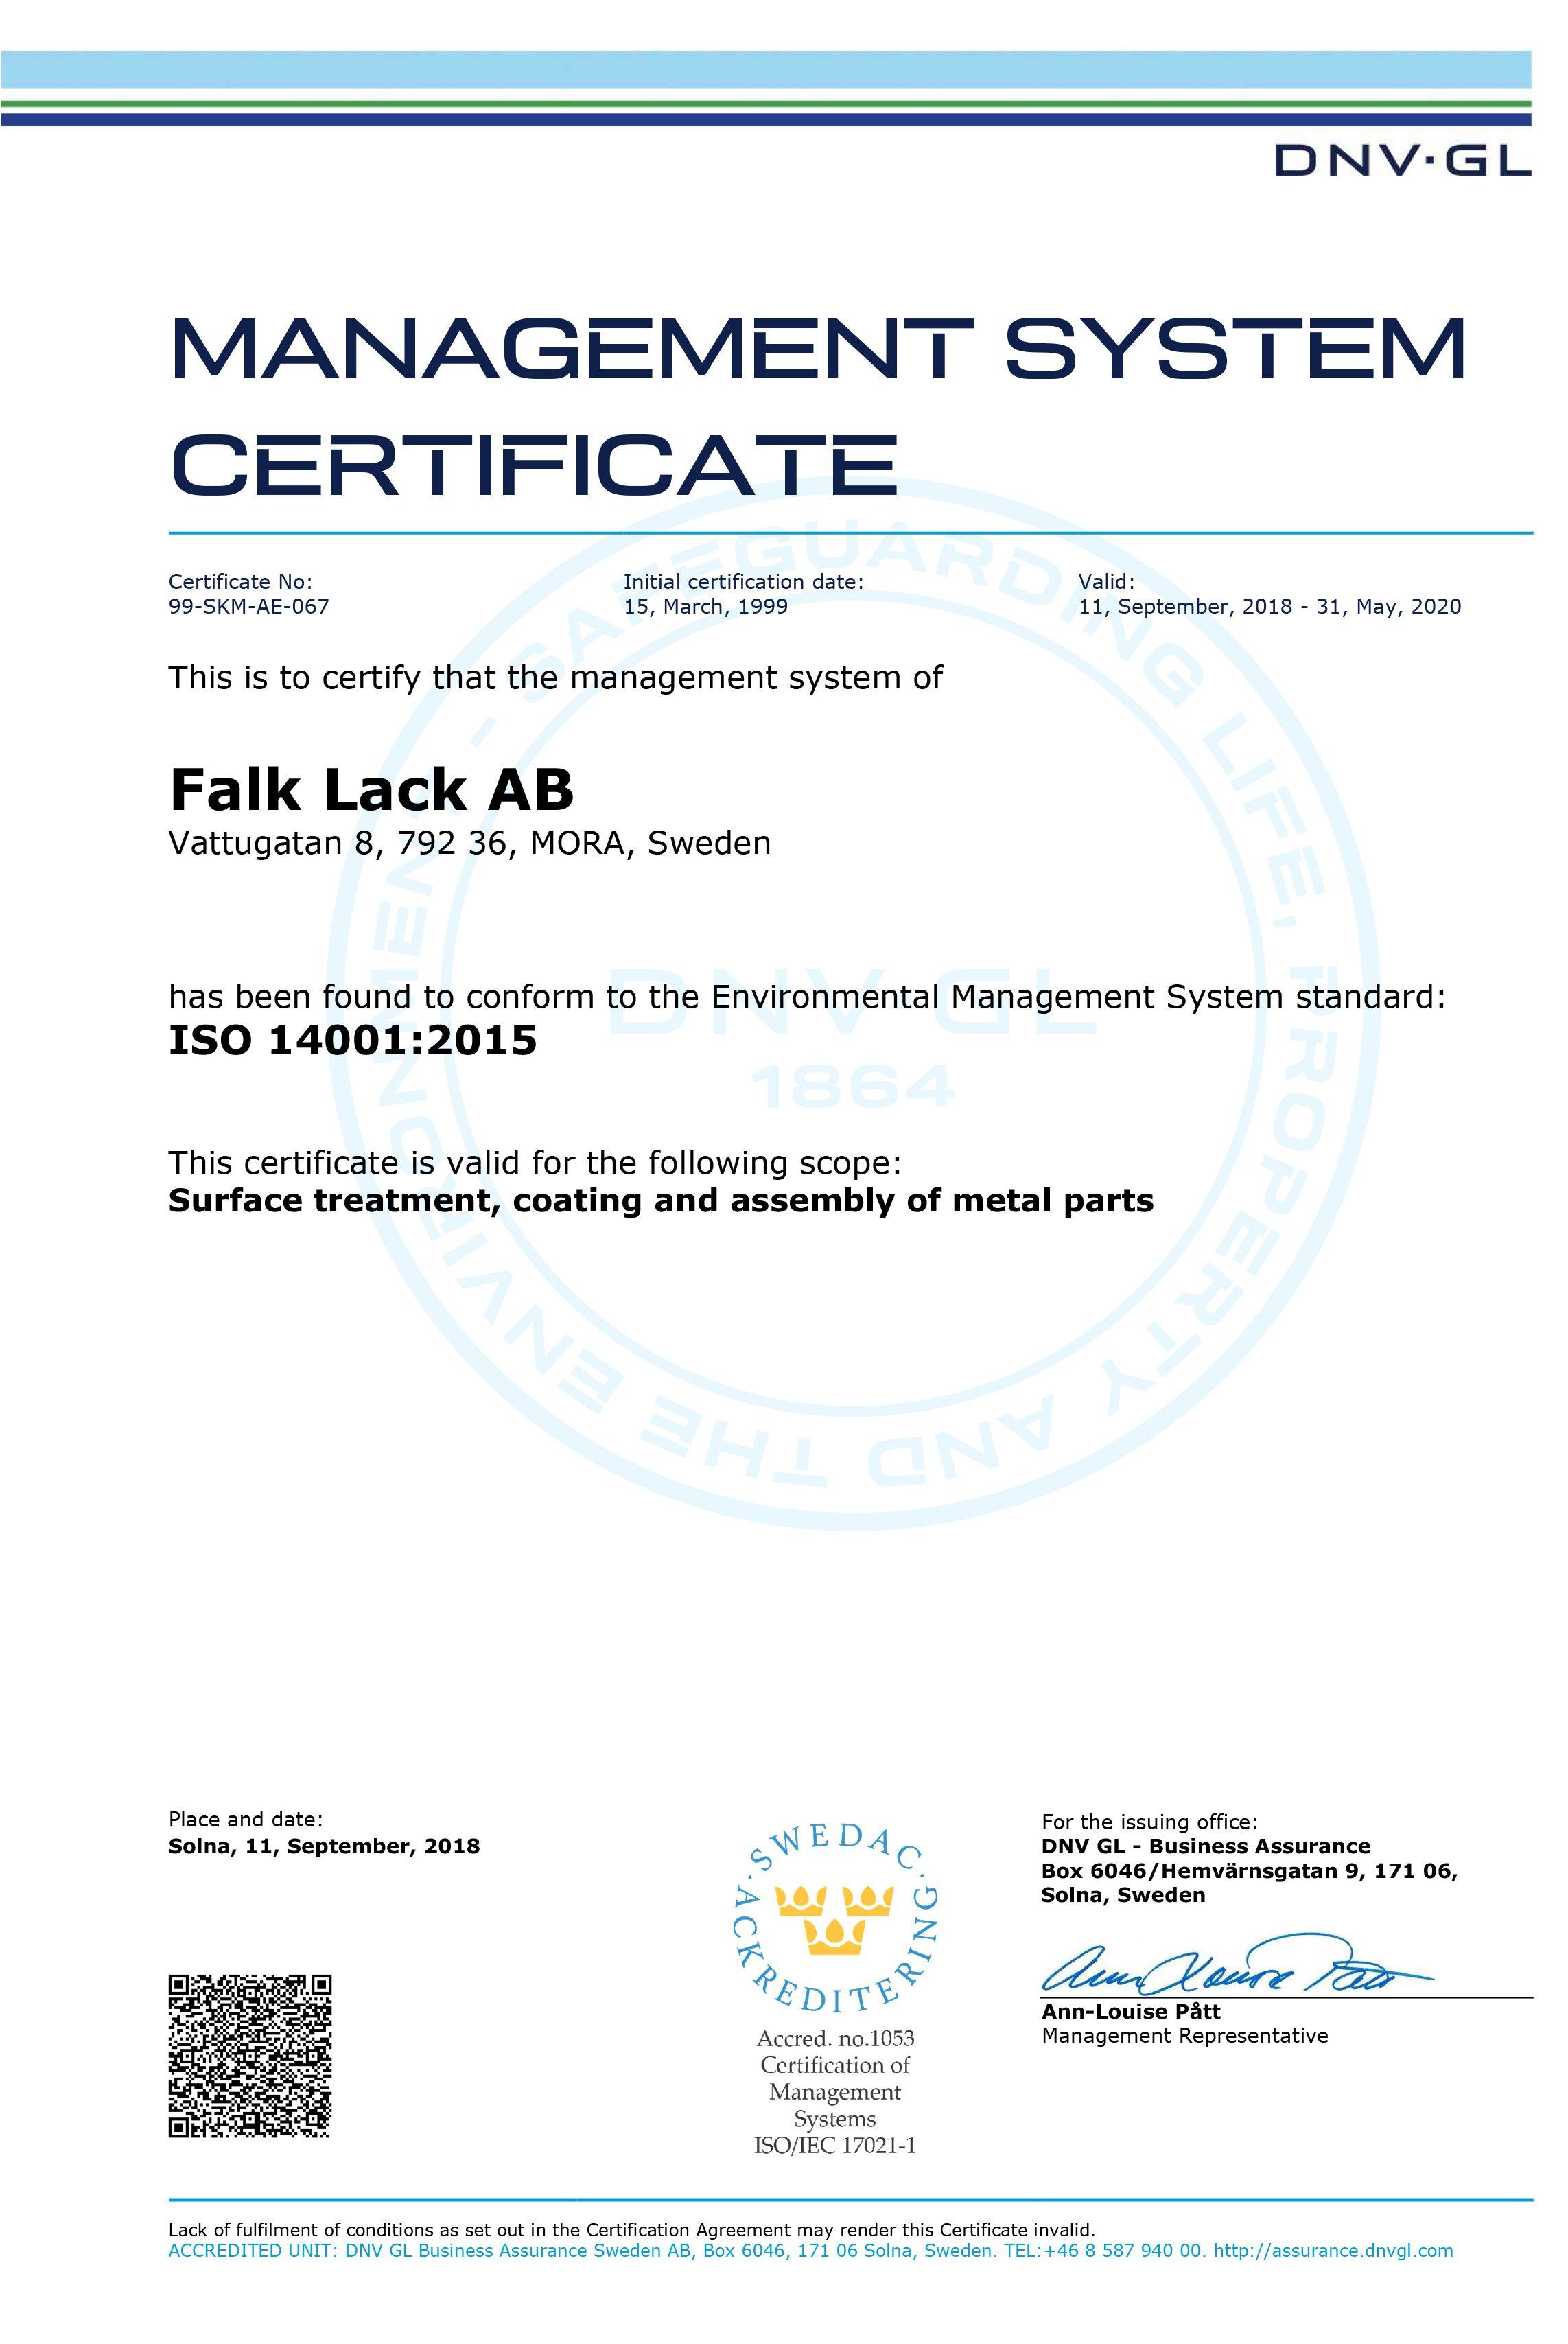 Microsoft Word - Falk Lack AB eng 14001